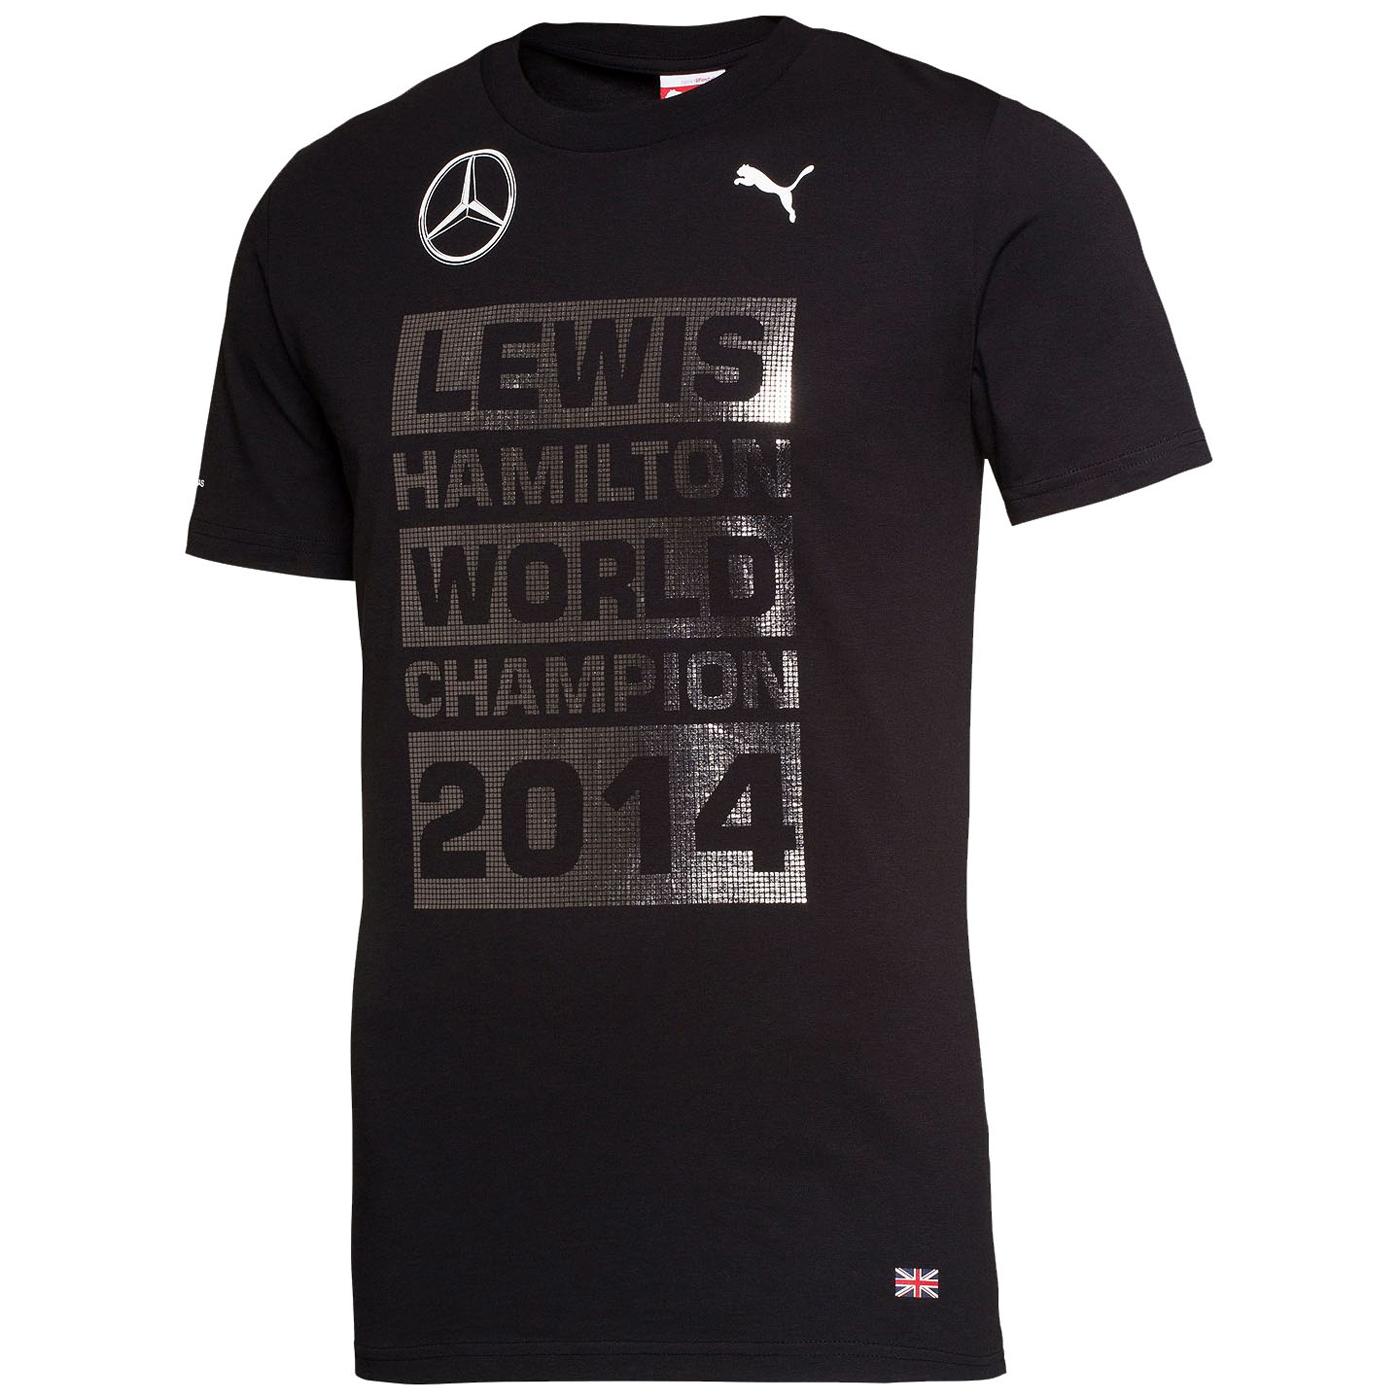 Mercedes AMG Petronas Lewis Hamilton 2014 World Champion T-Shirt